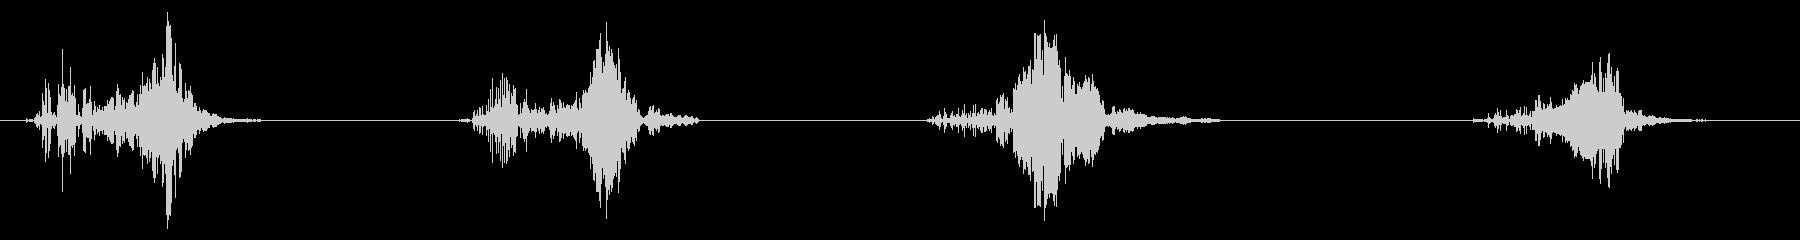 Ptexジップ、4Xの未再生の波形